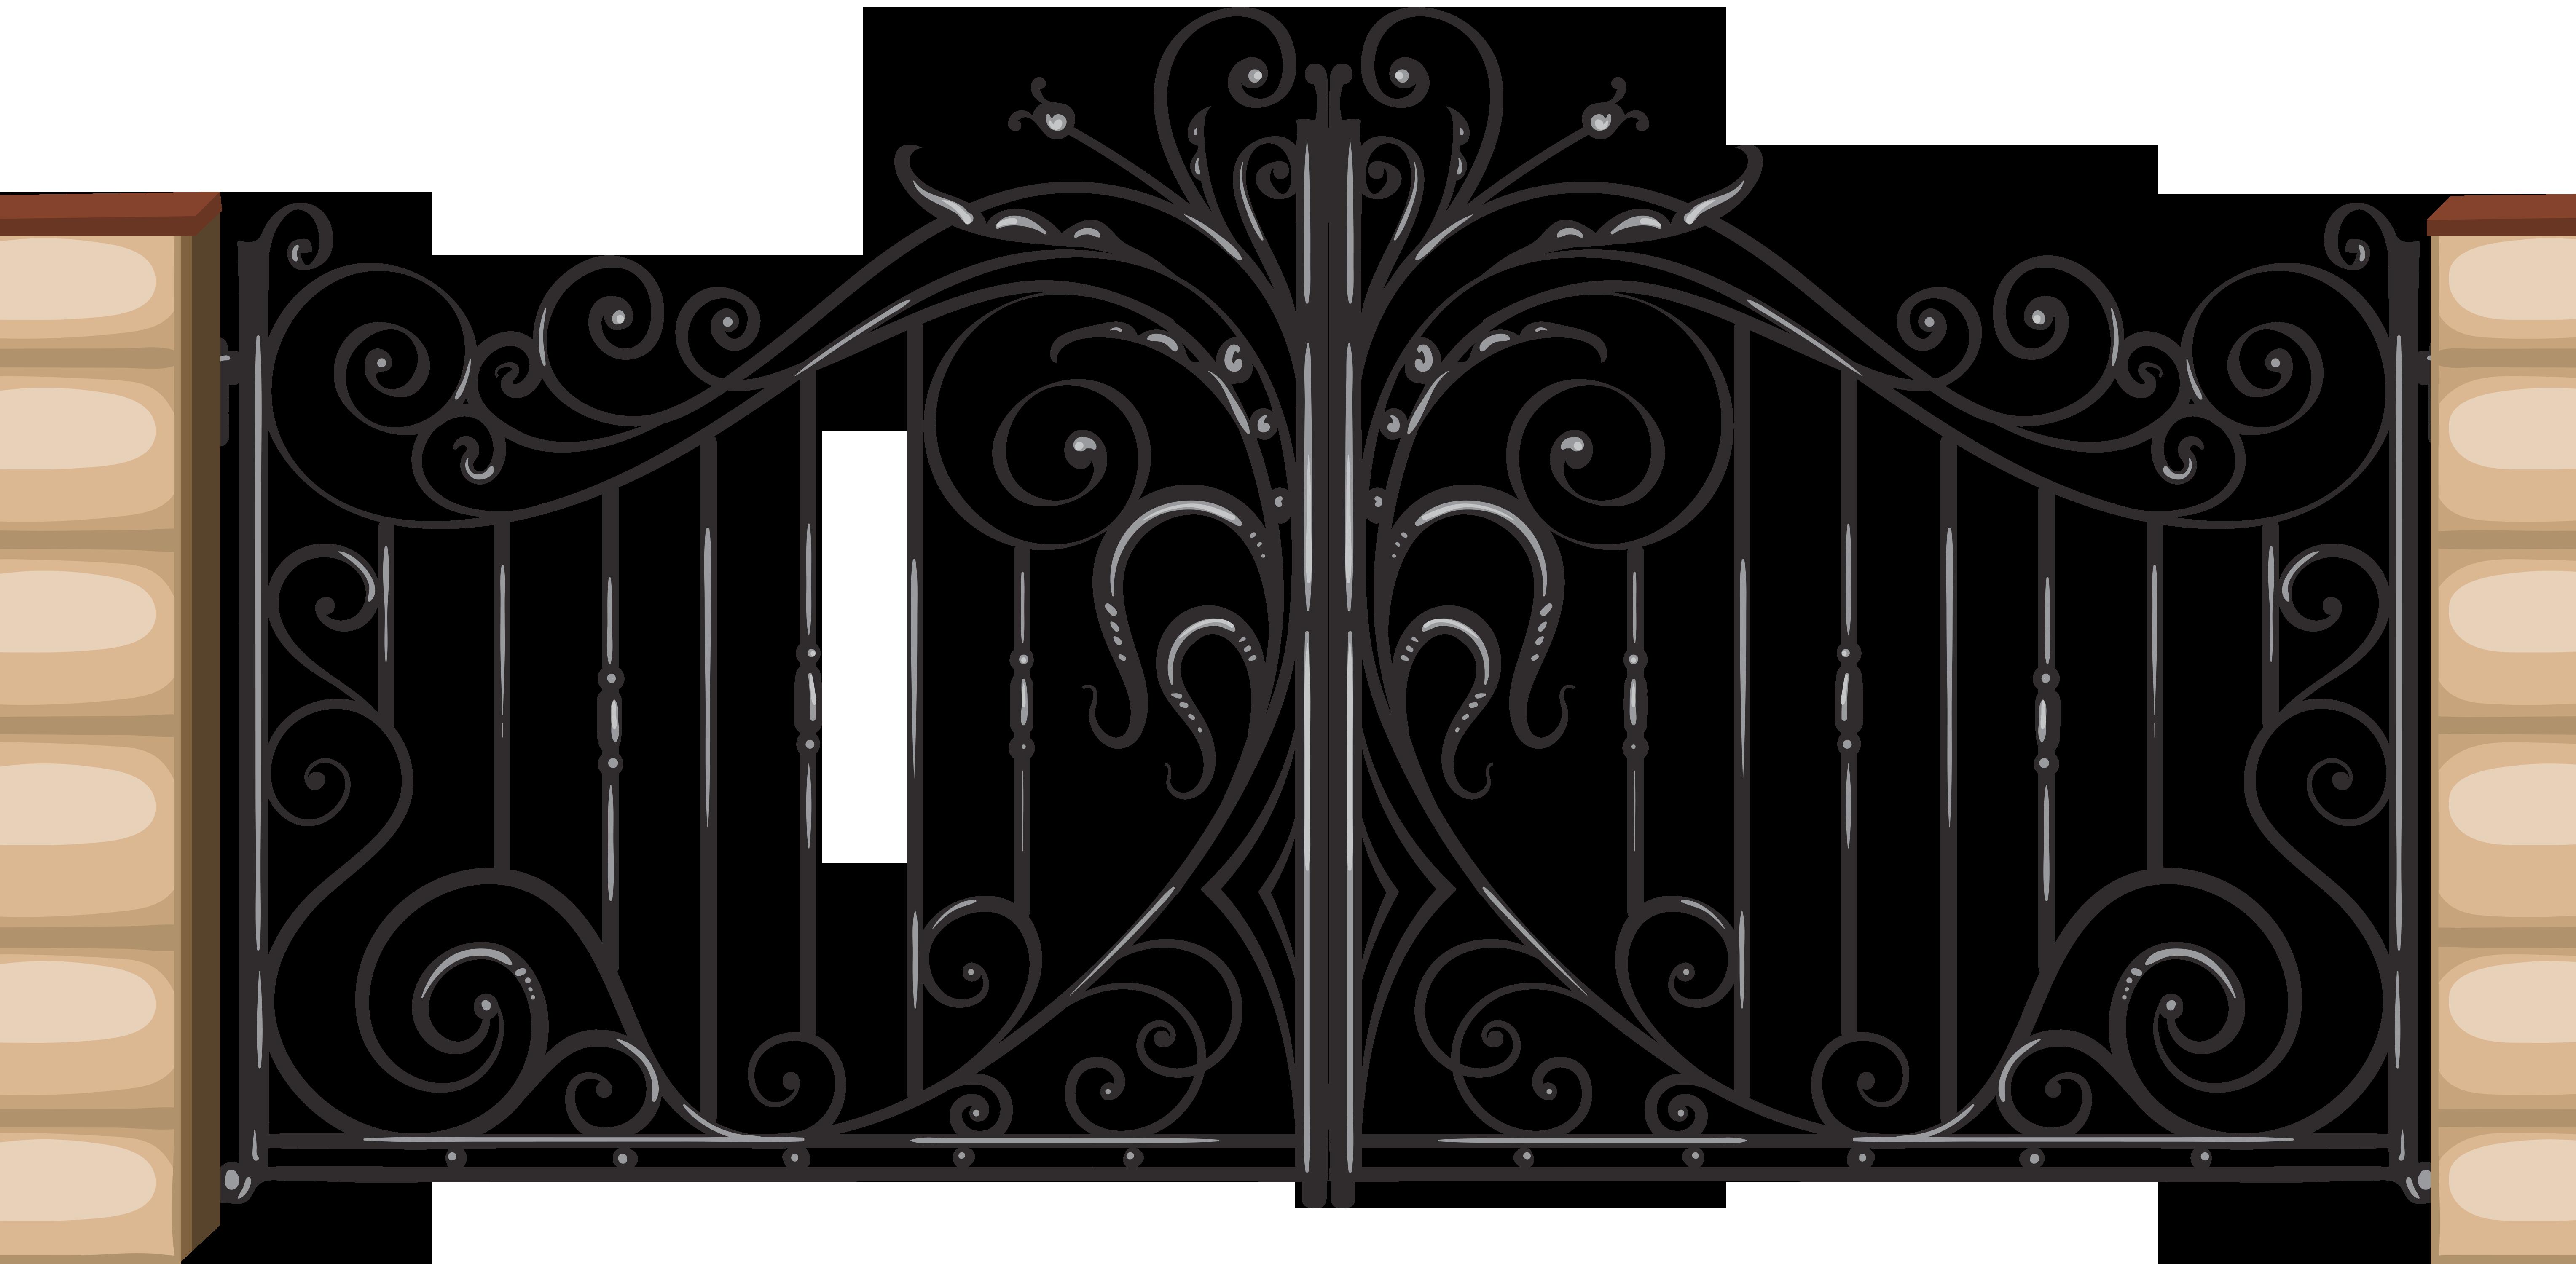 Pin By Wahyu Ida On Wall Backgrounds Decorative Elements Wrought Iron Driveway Gates Iron Gate Design Metal Gates Design